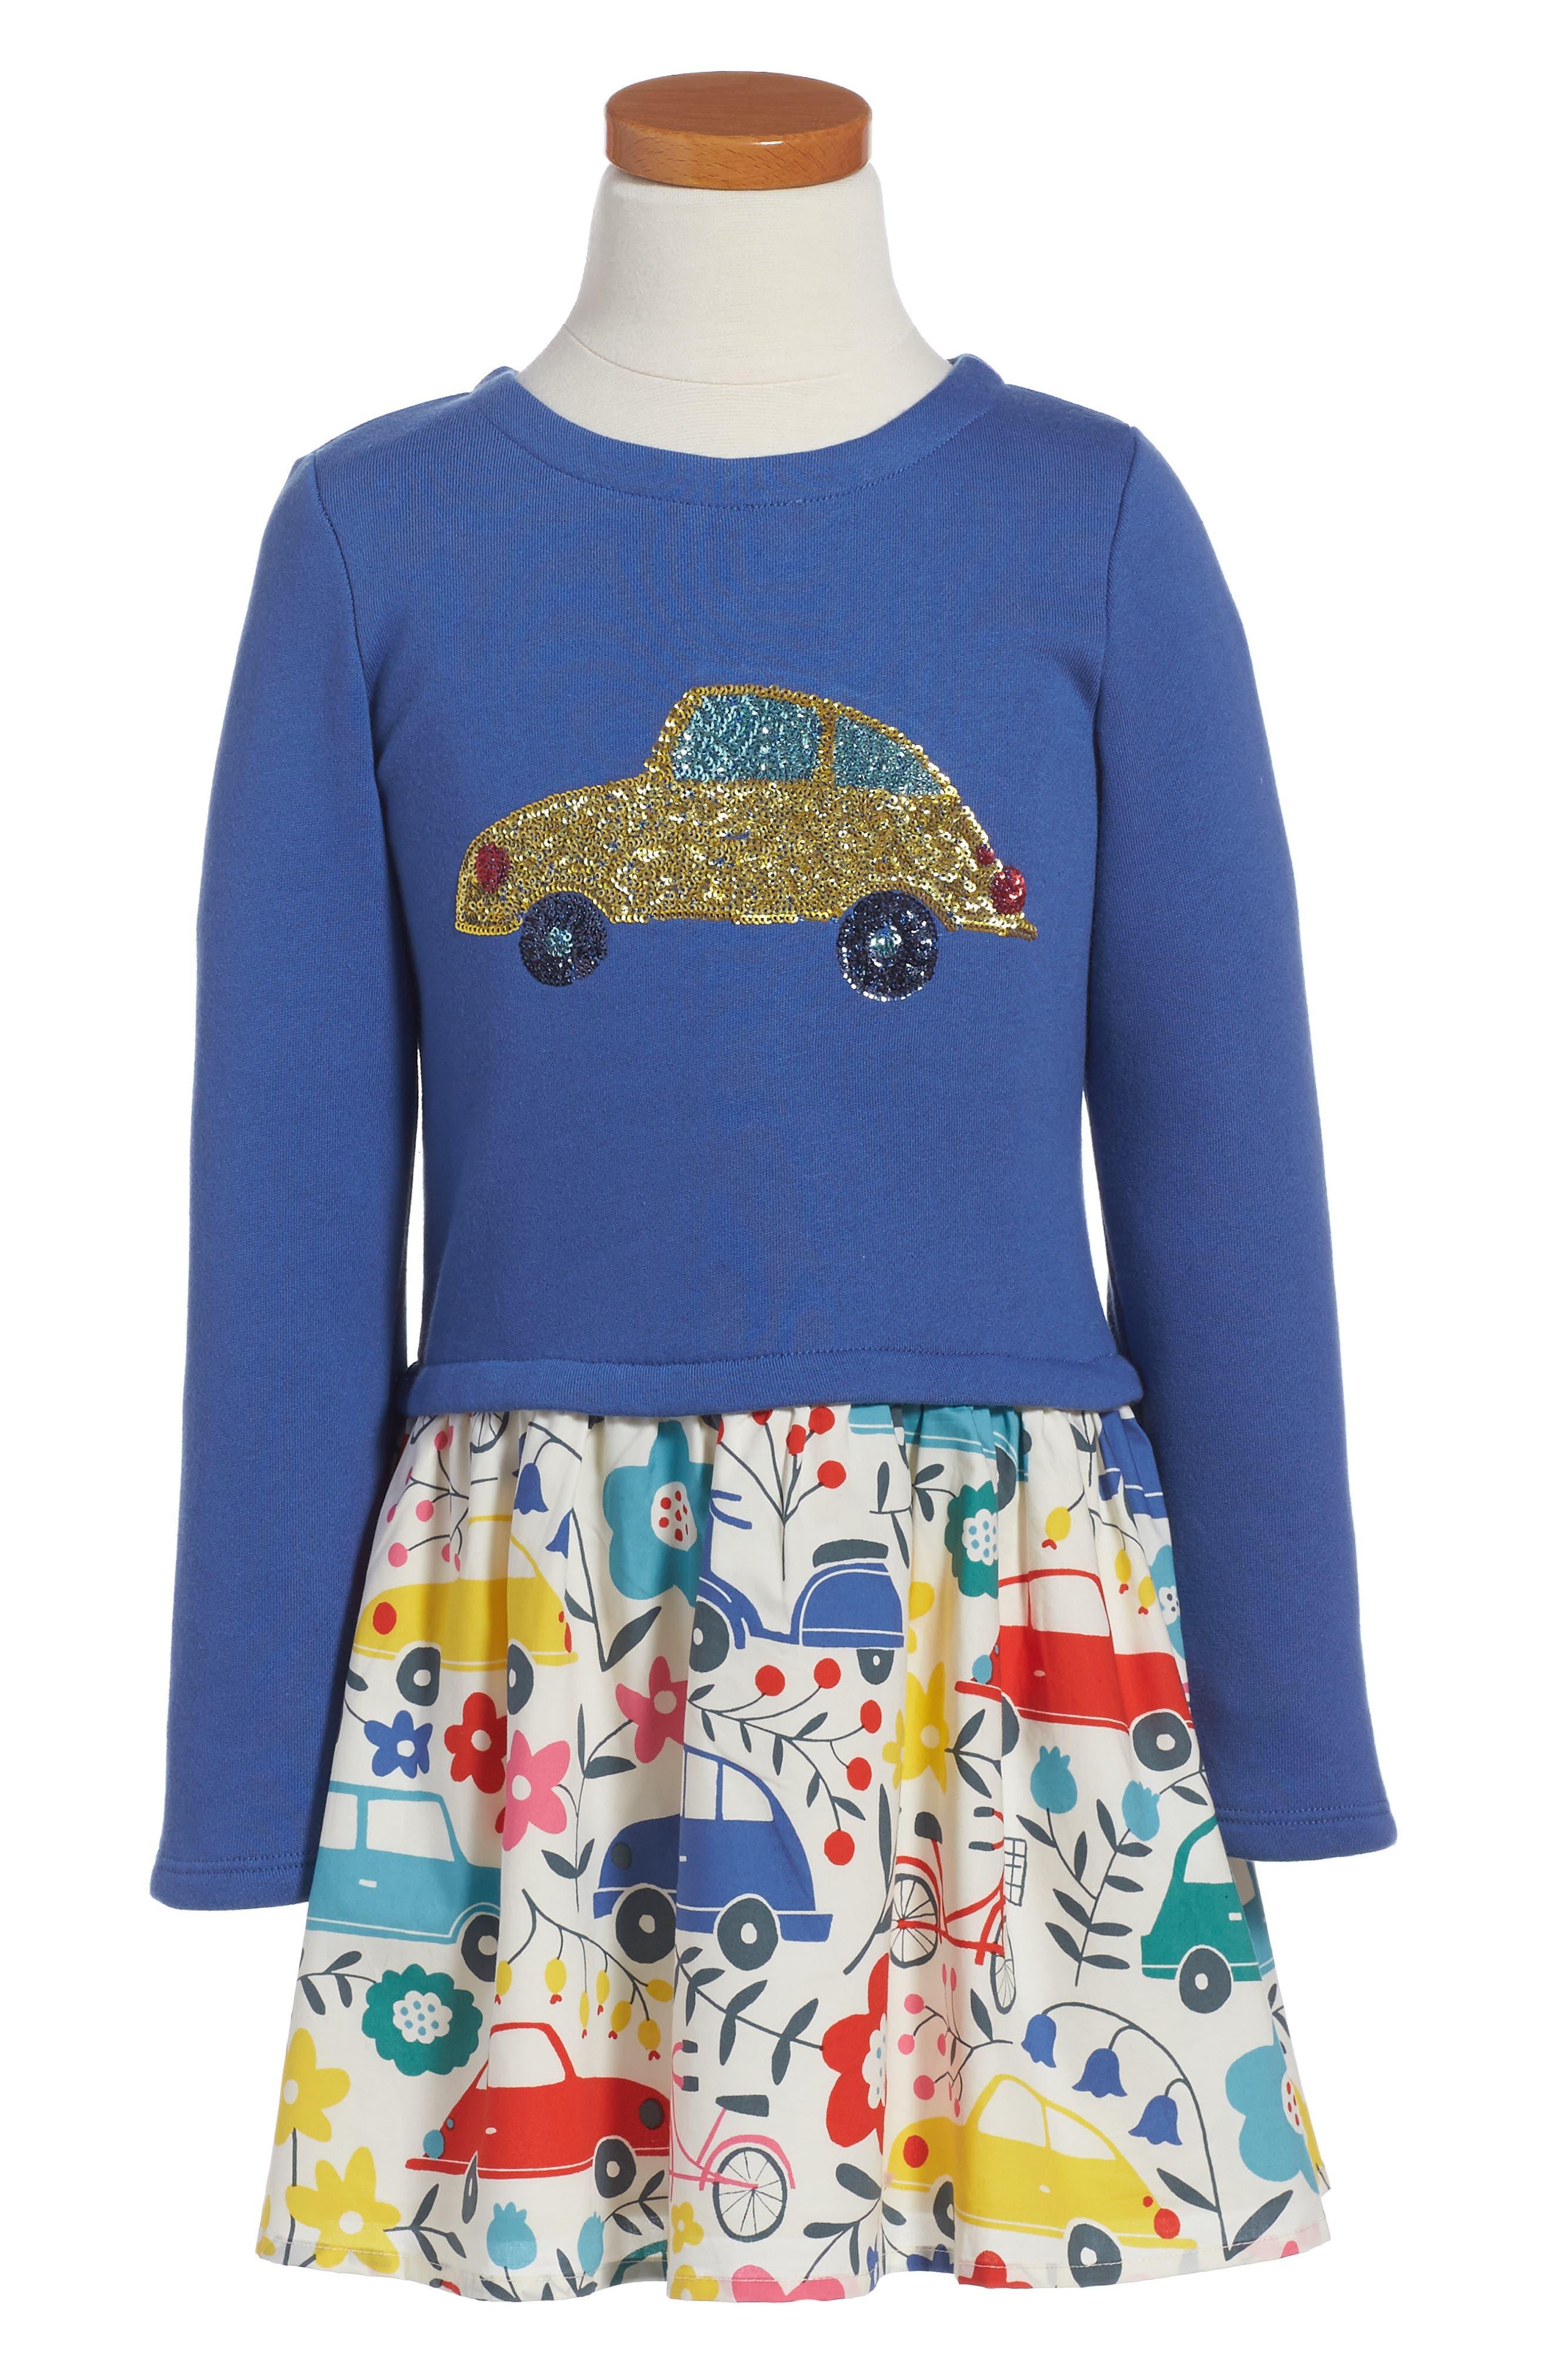 Sequin Appliqué Dress,                             Main thumbnail 1, color,                             Bluebell